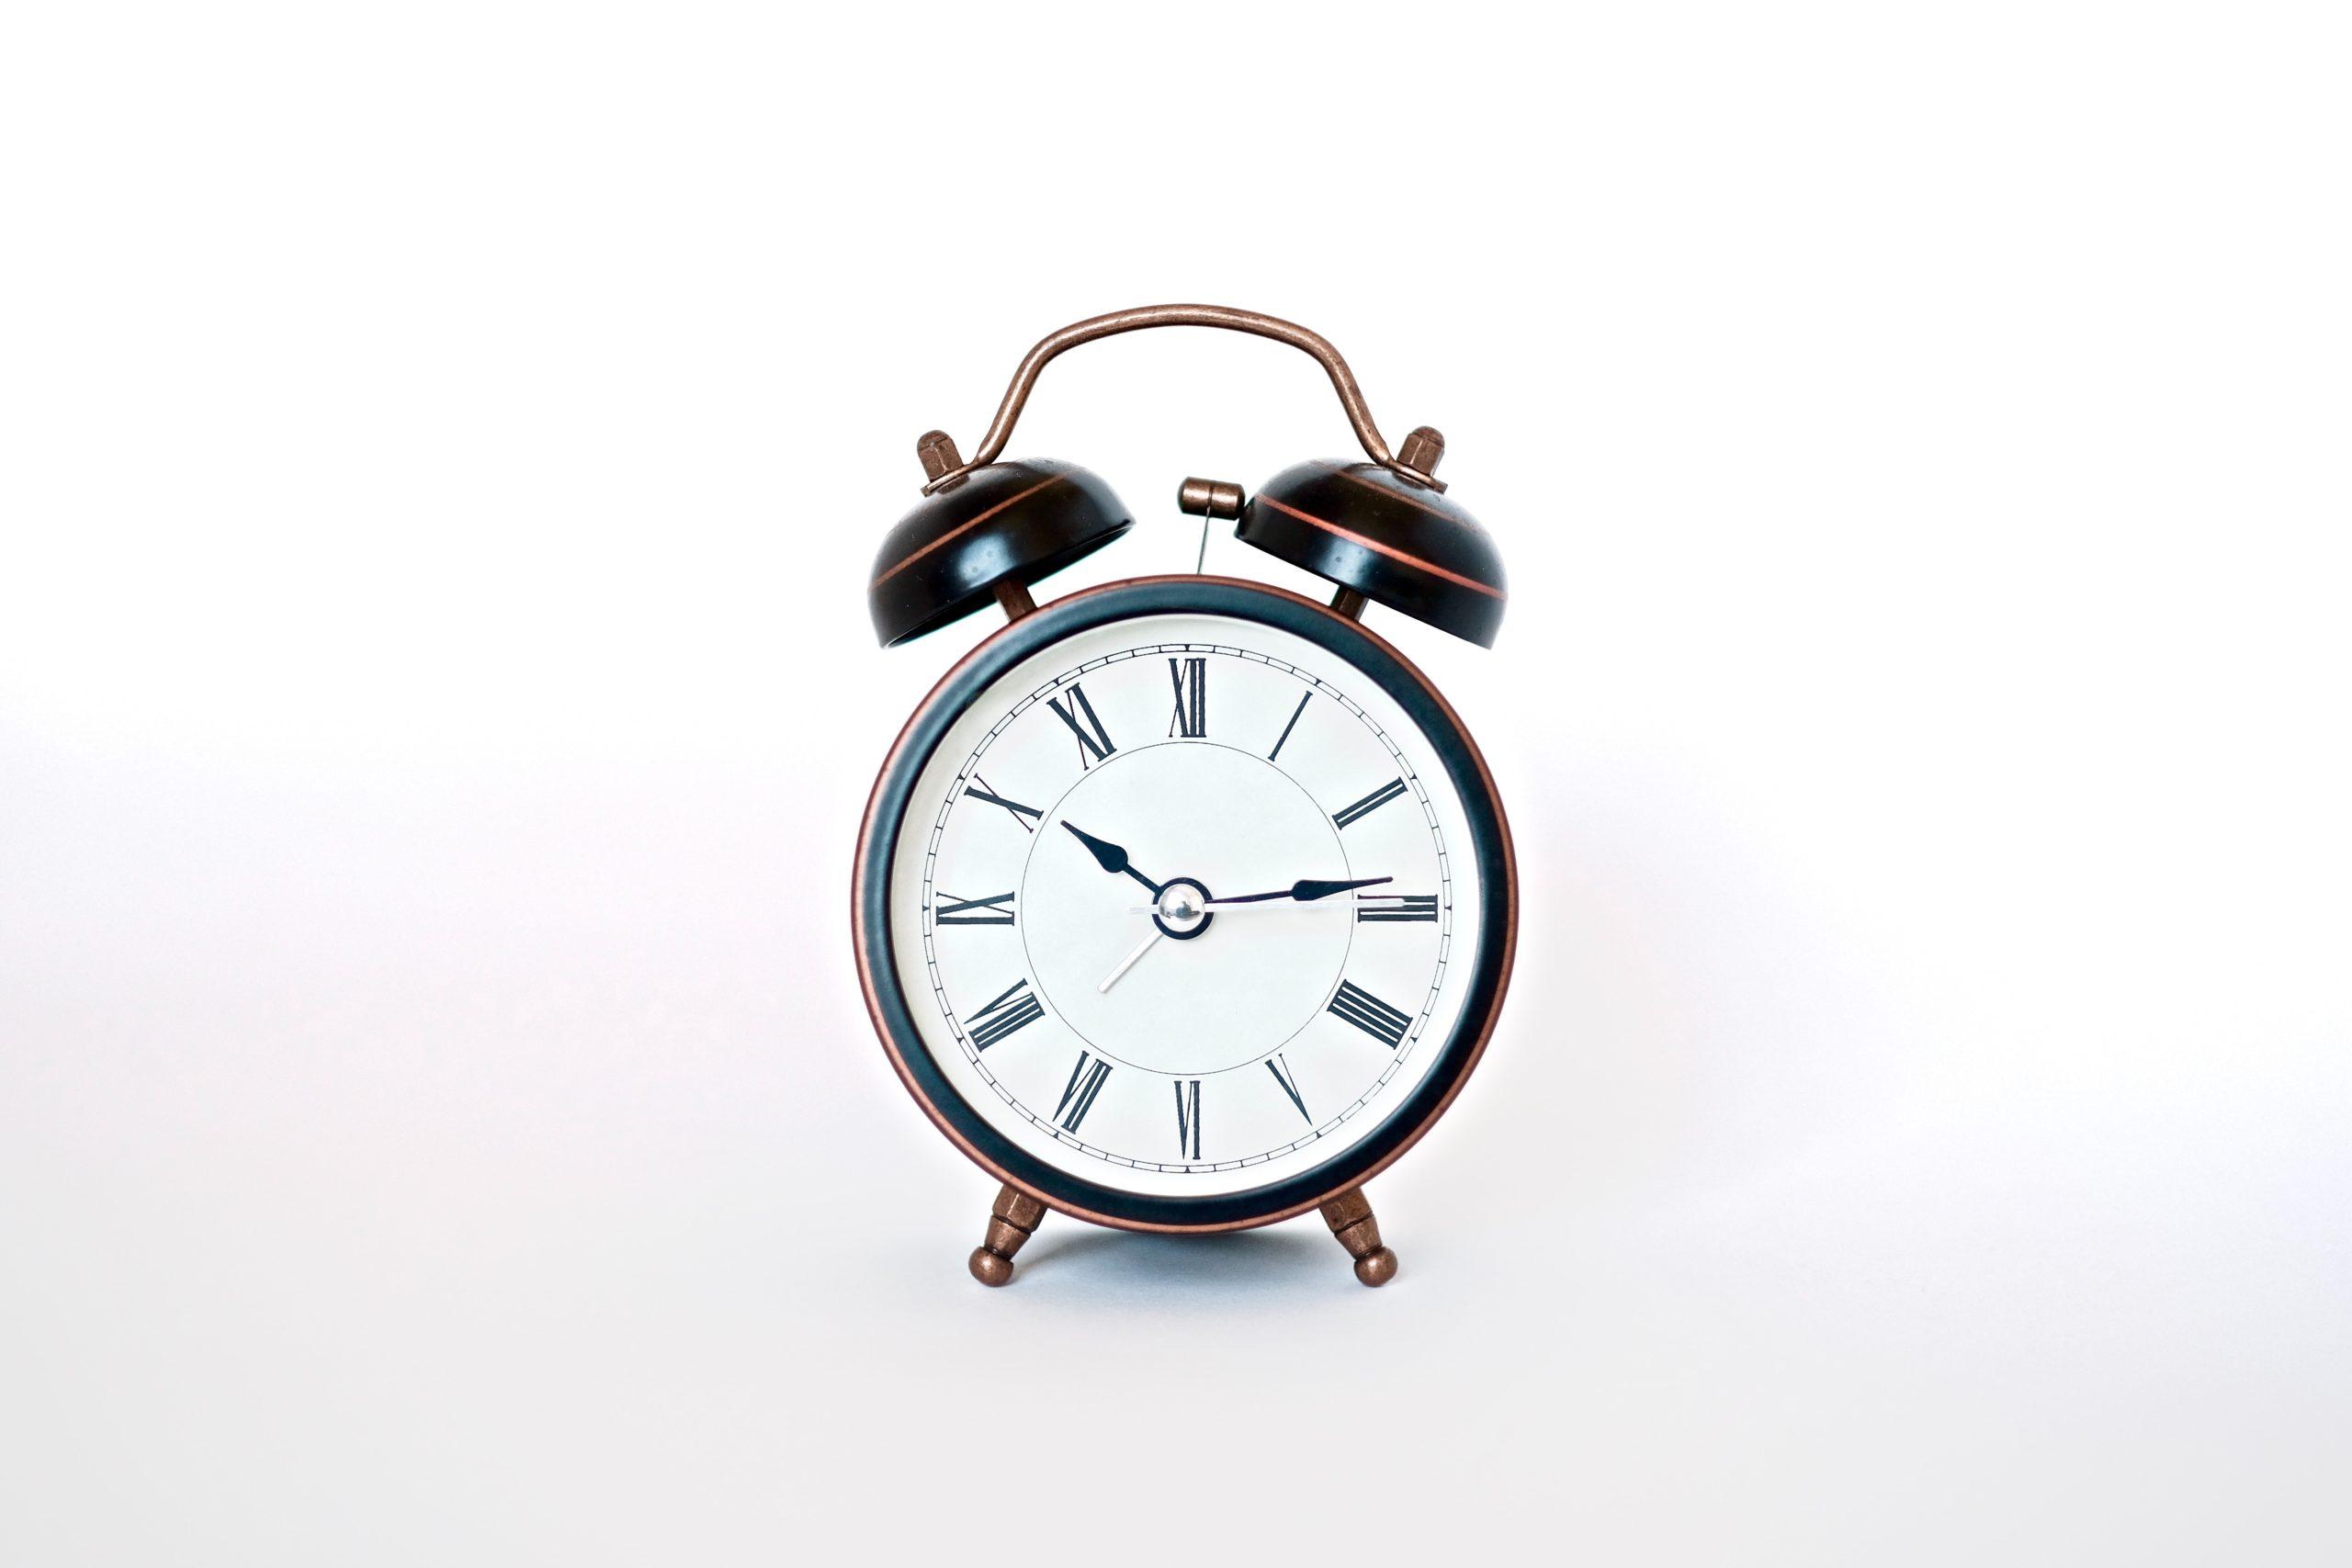 cool alarm clocks 2021